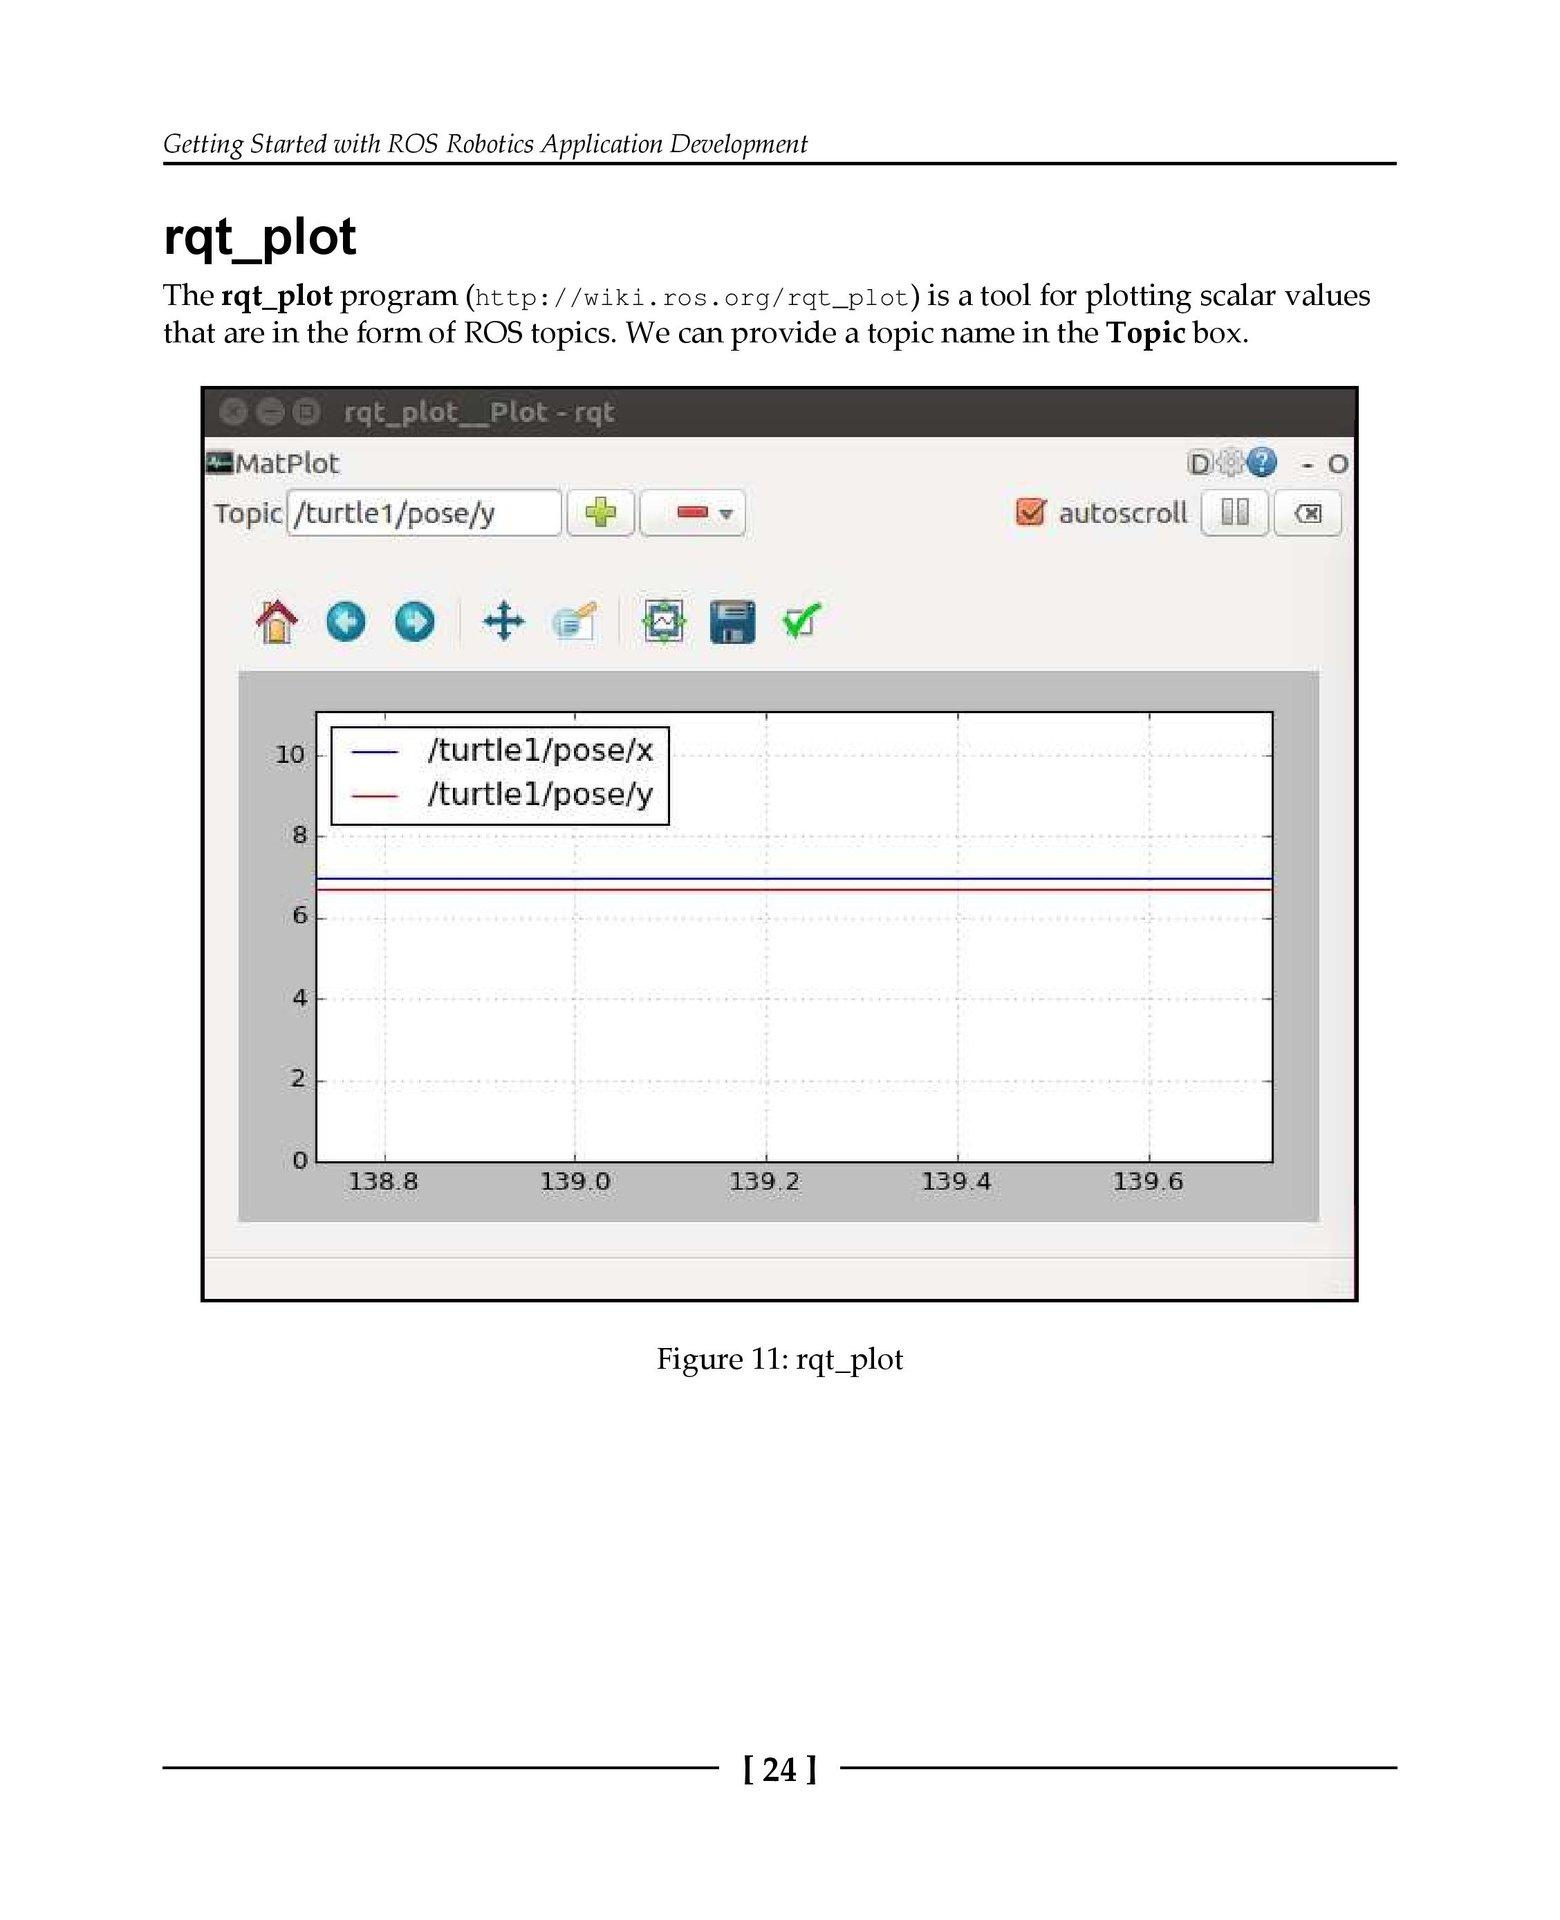 9781783554713 ros robotics projects %281%29 ilovepdf compressed %281%29 page 042